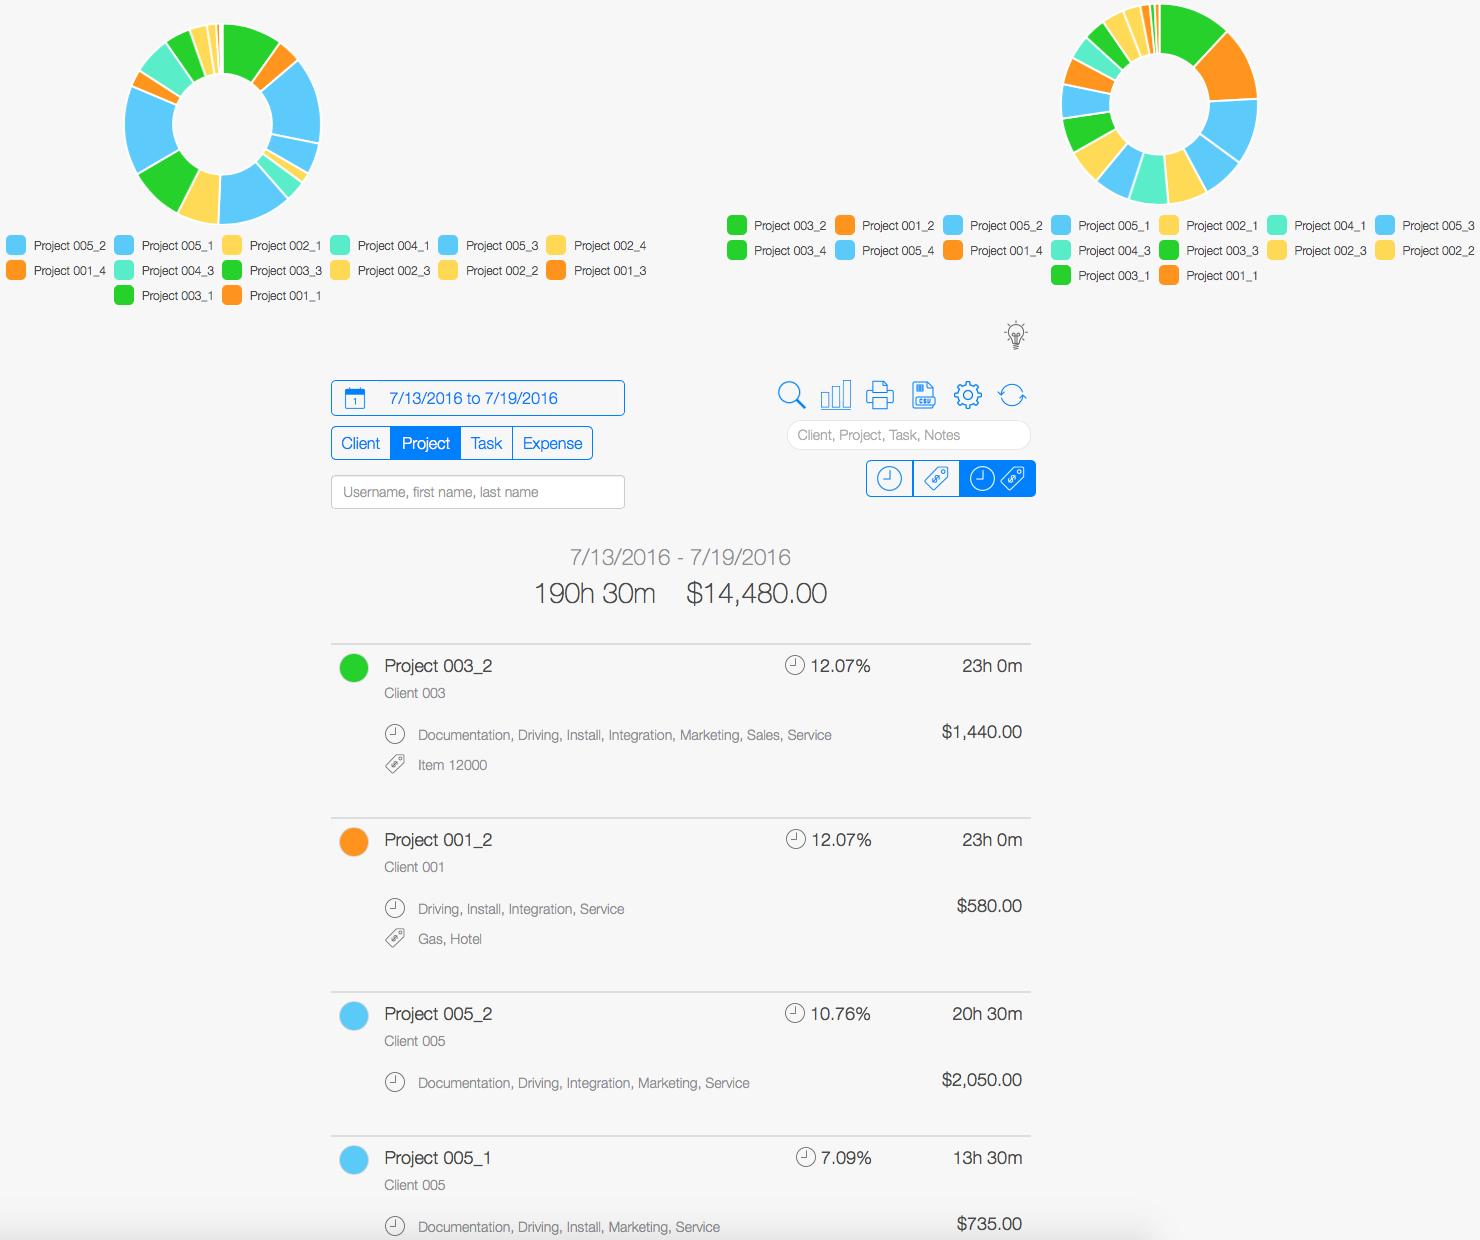 Project Evaluation - Web app